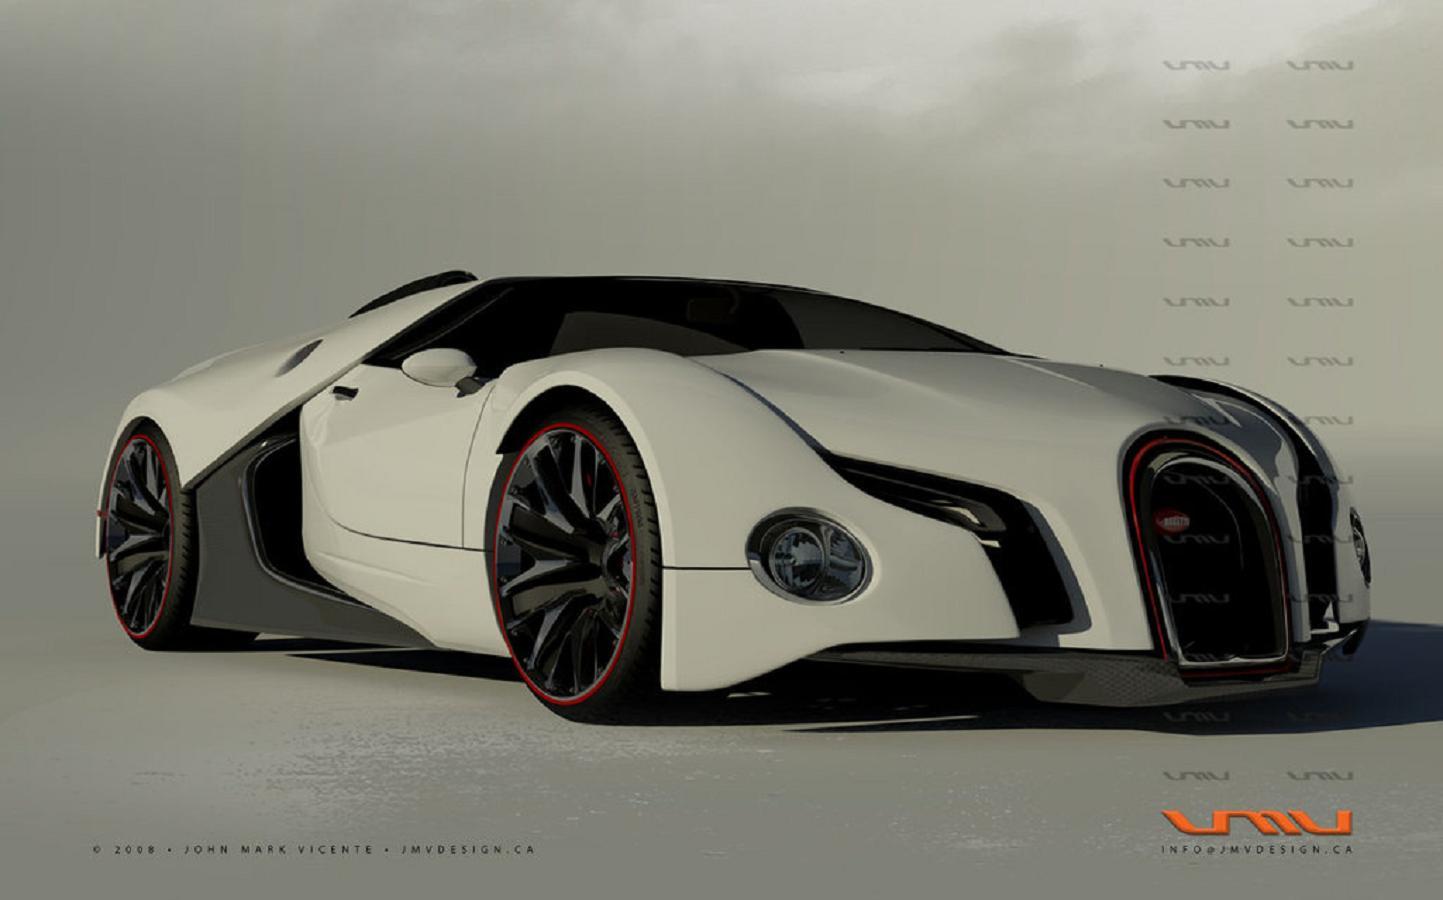 Supercar Wallpaper Hd - WallpaperSafari Bugatti Renaissance Concept